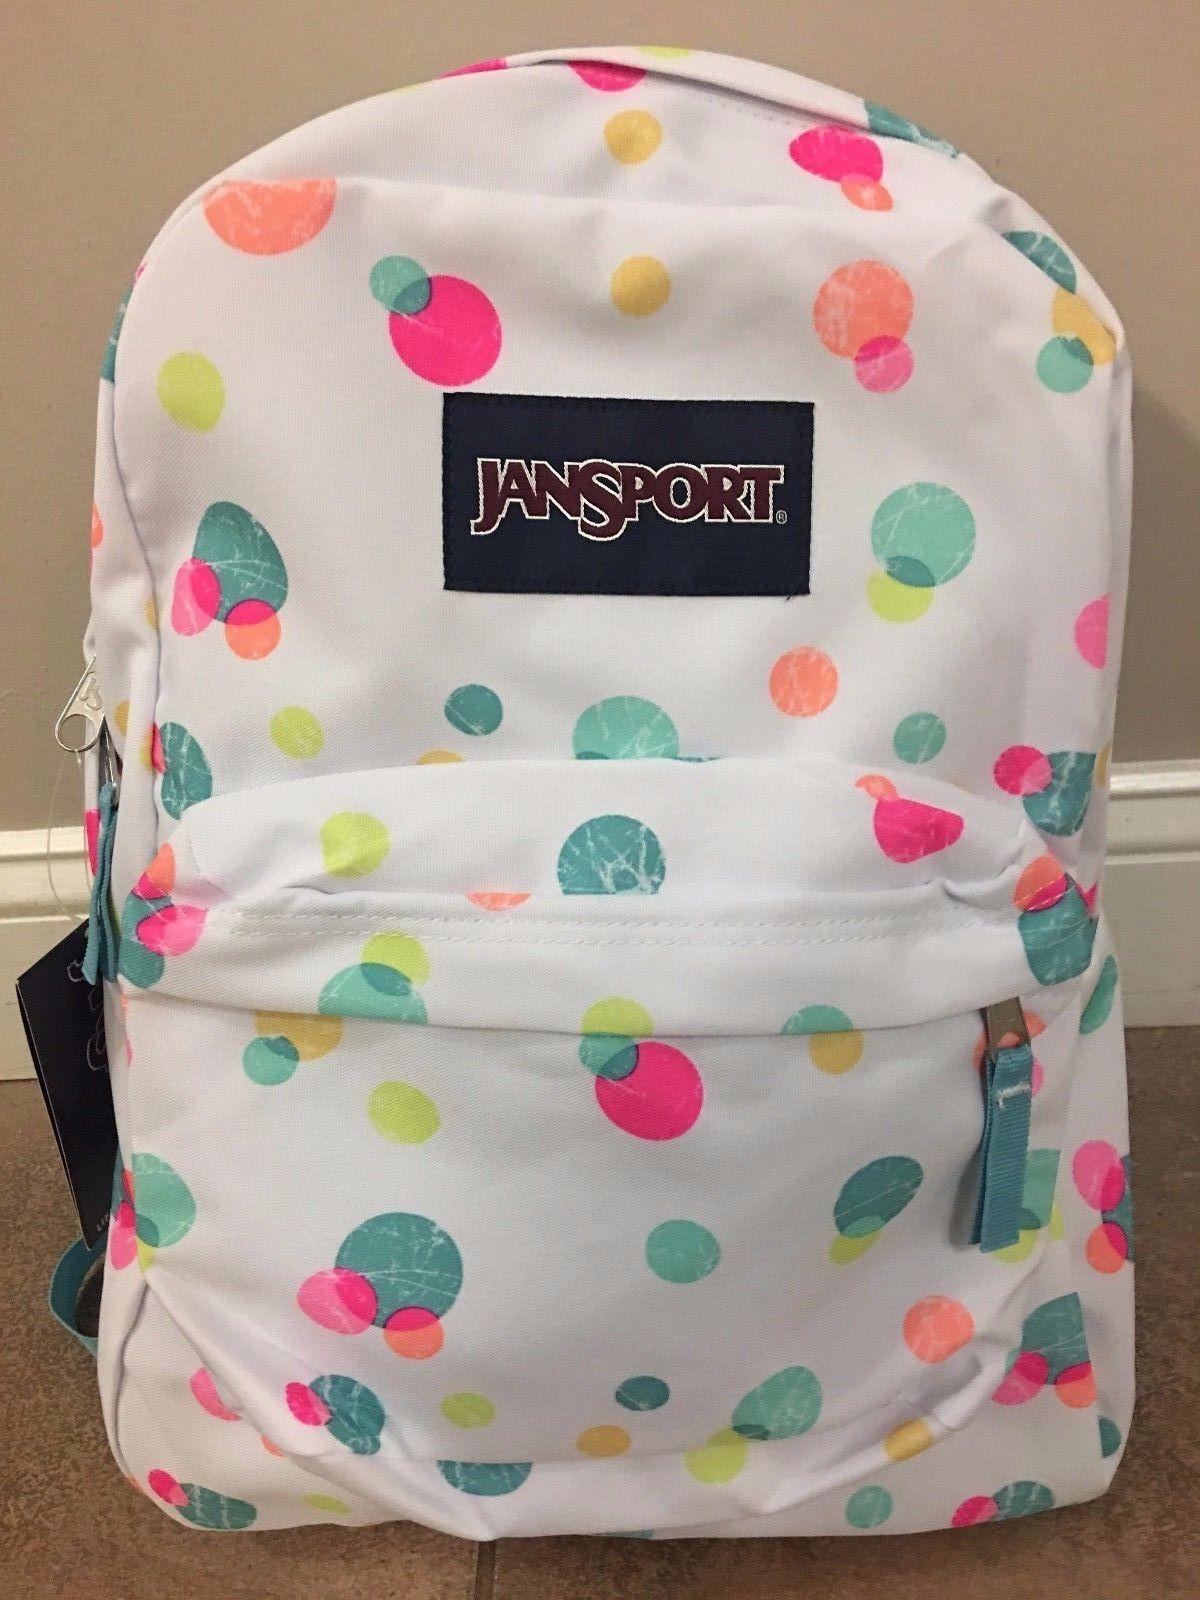 Backpacks 57917: Jansport Backpack School Bag Pink Pansy Confetti ...